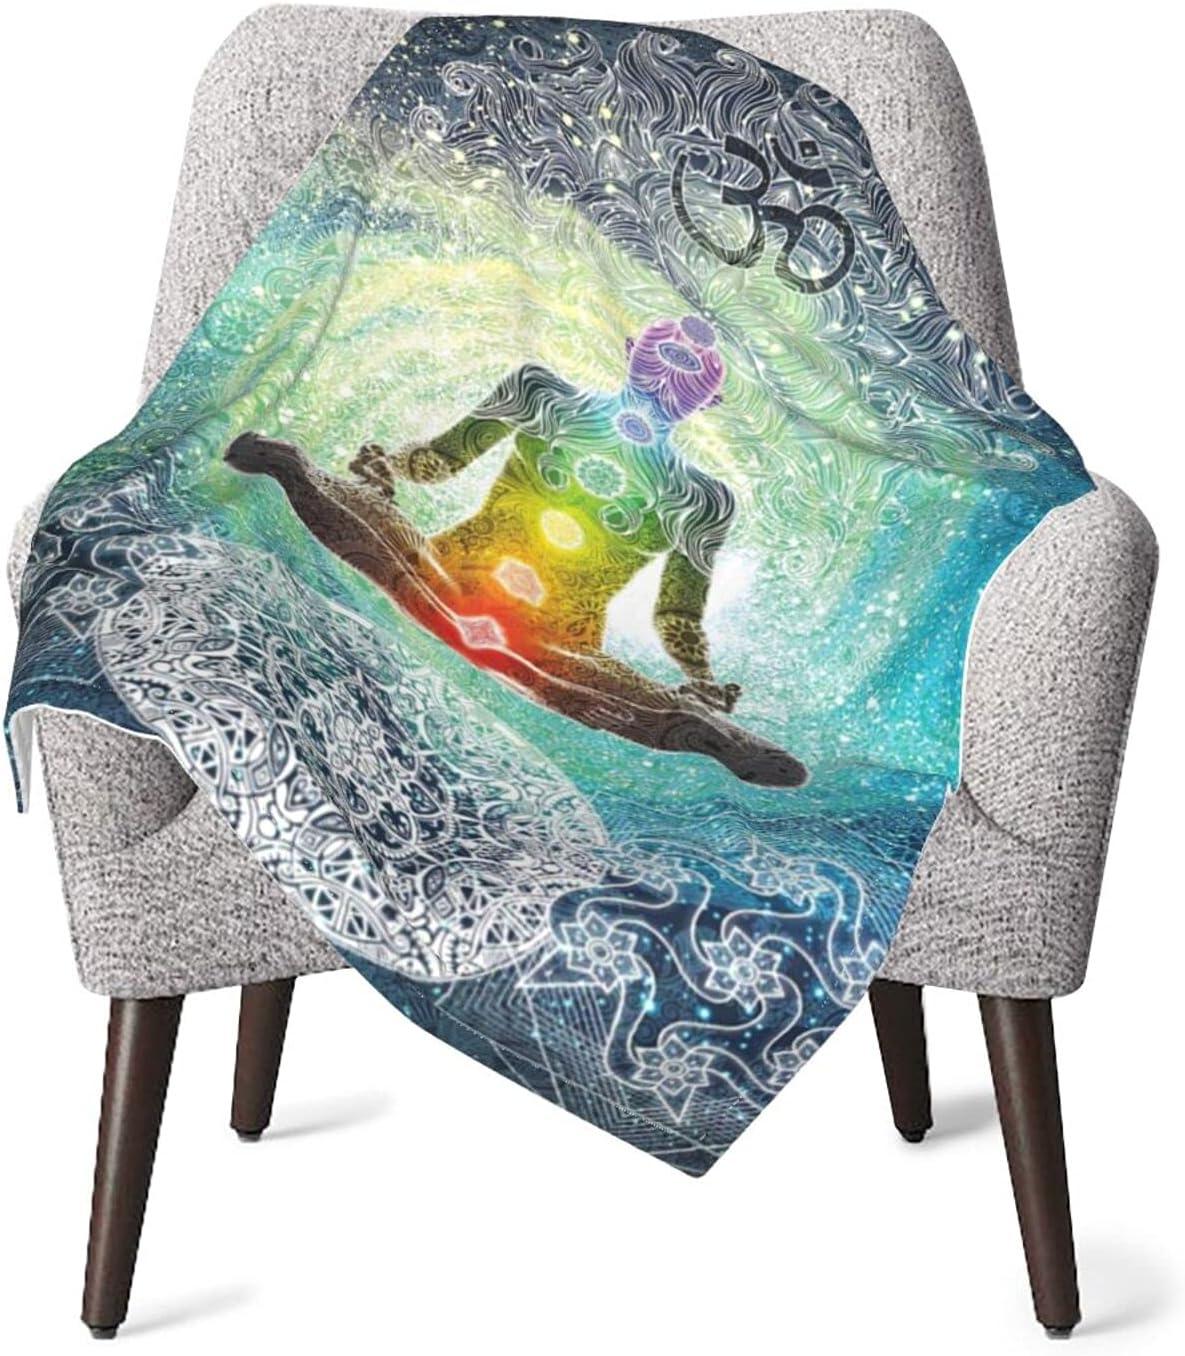 JZDACH Unisex Baby cheap Popular products Receiving Yoga Chak Mandala Meditation Hippie